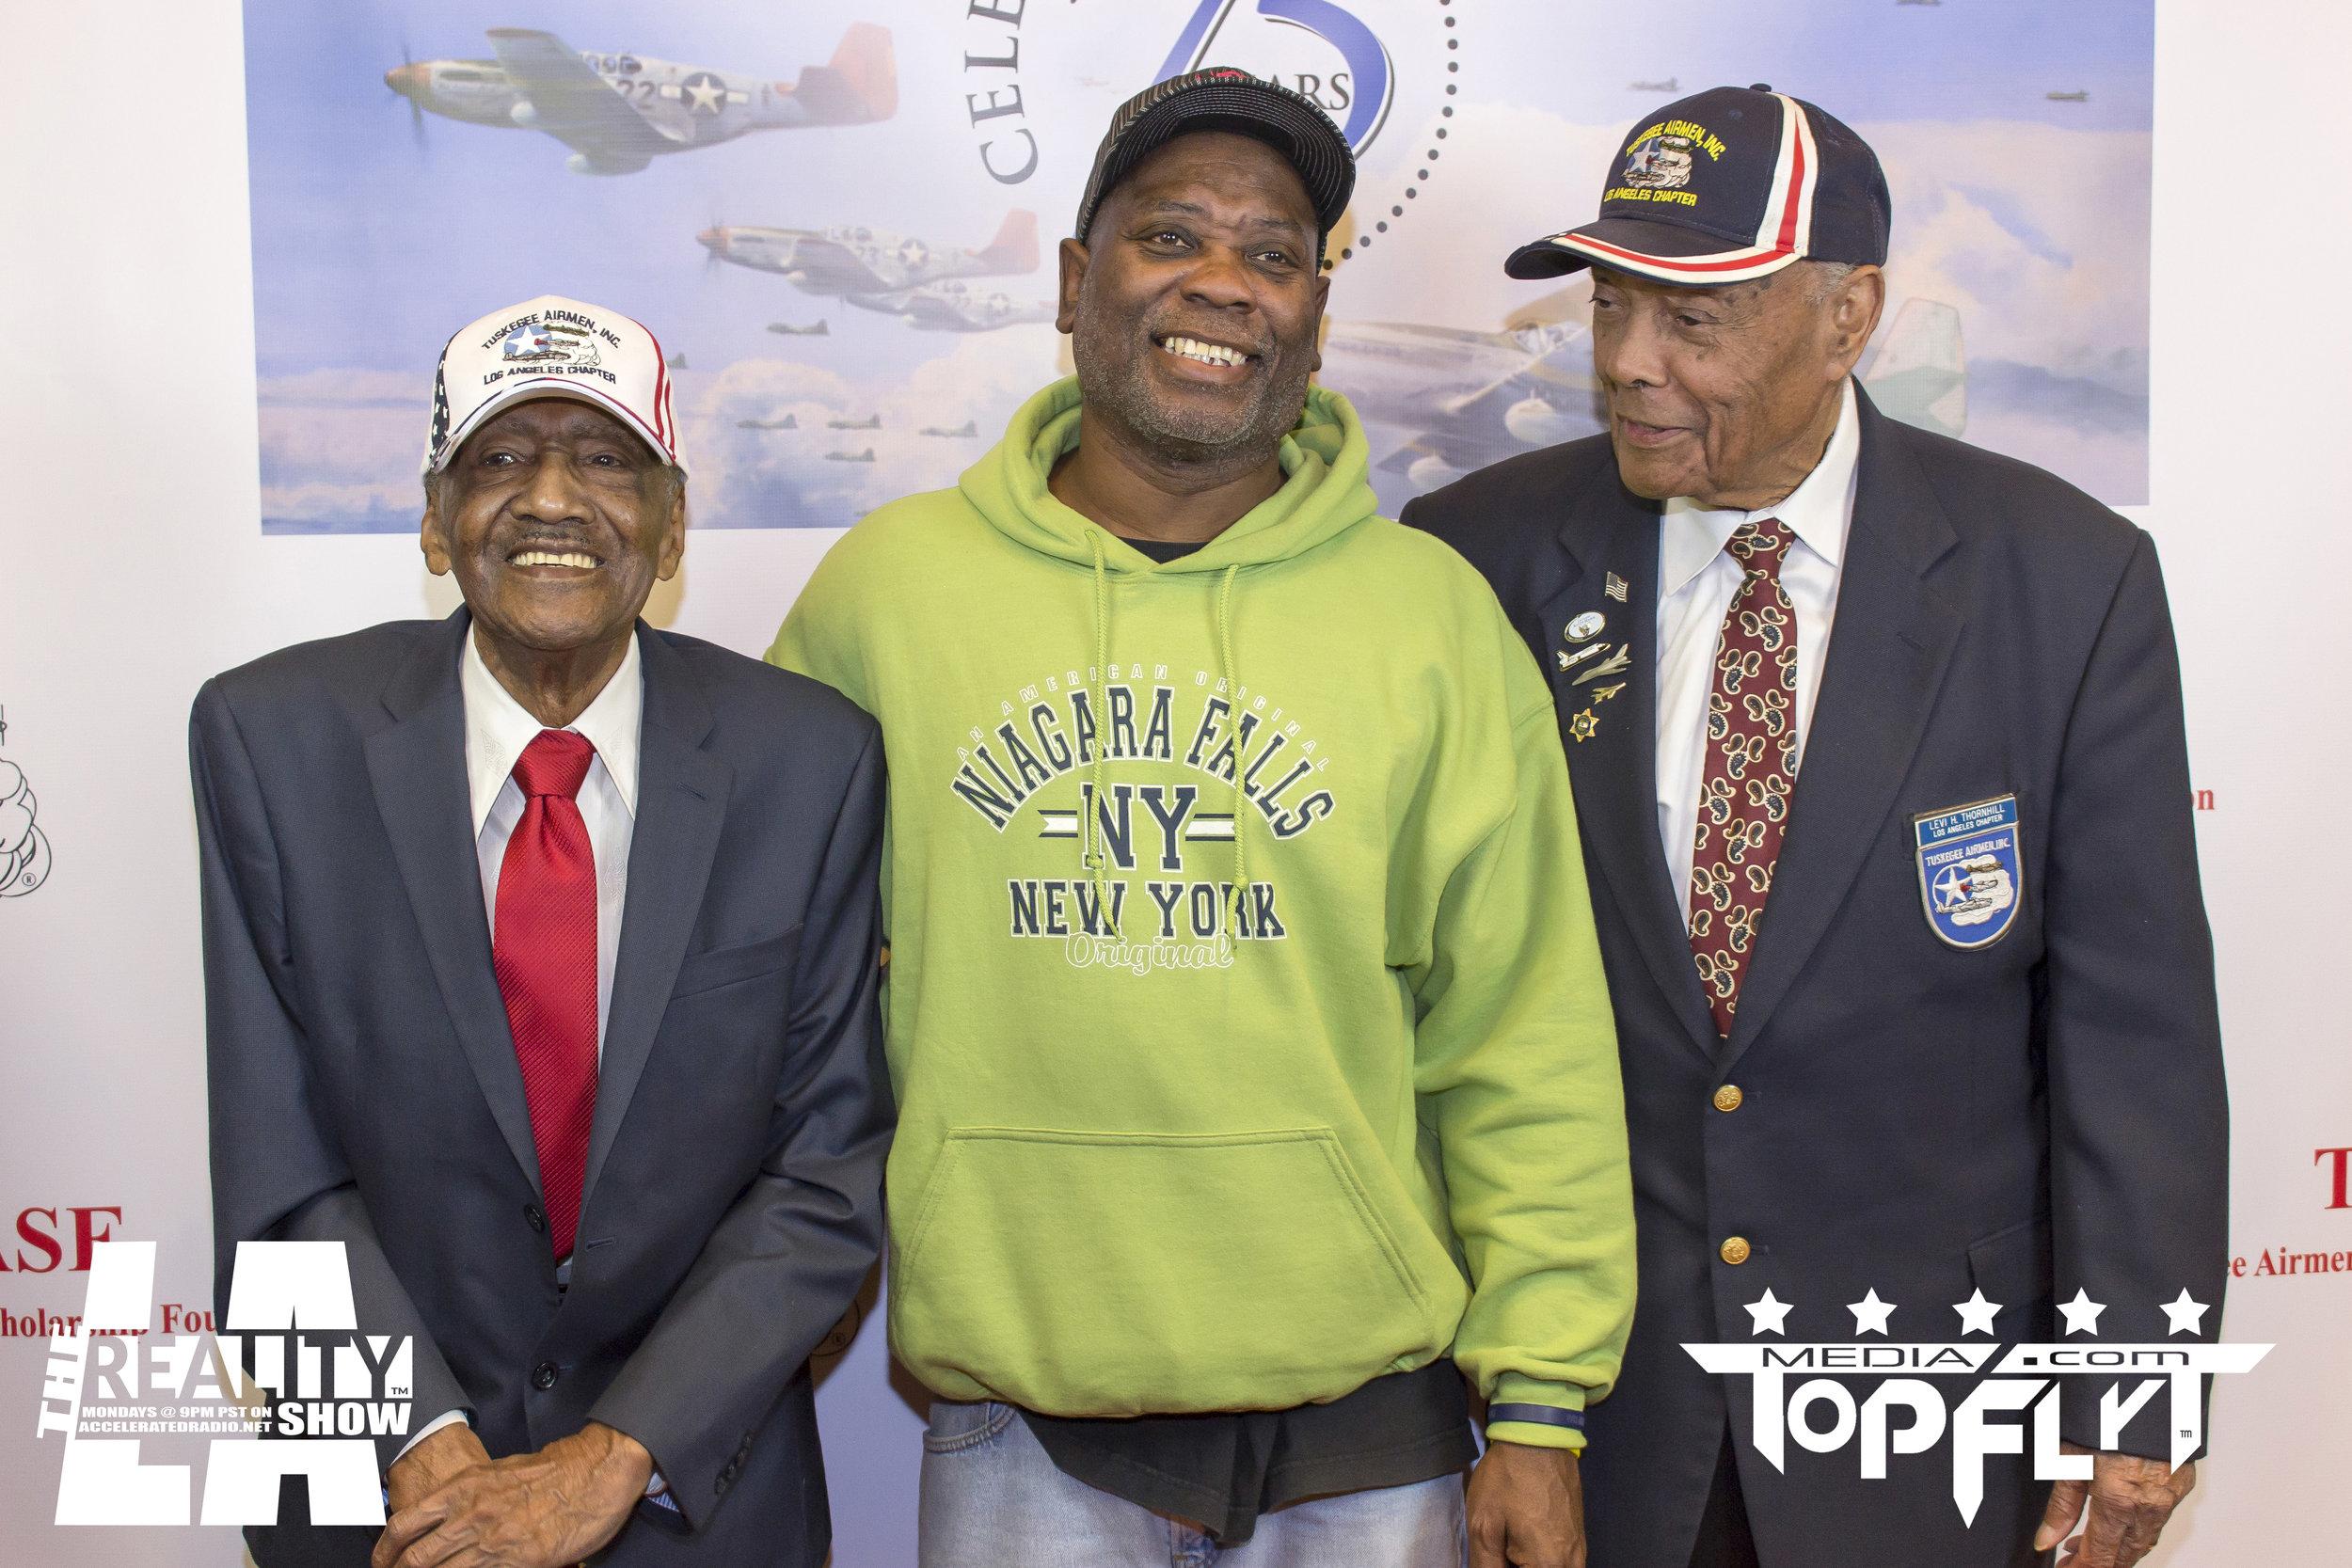 The Reality Show LA - Tuskegee Airmen 75th Anniversary VIP Reception_28.jpg